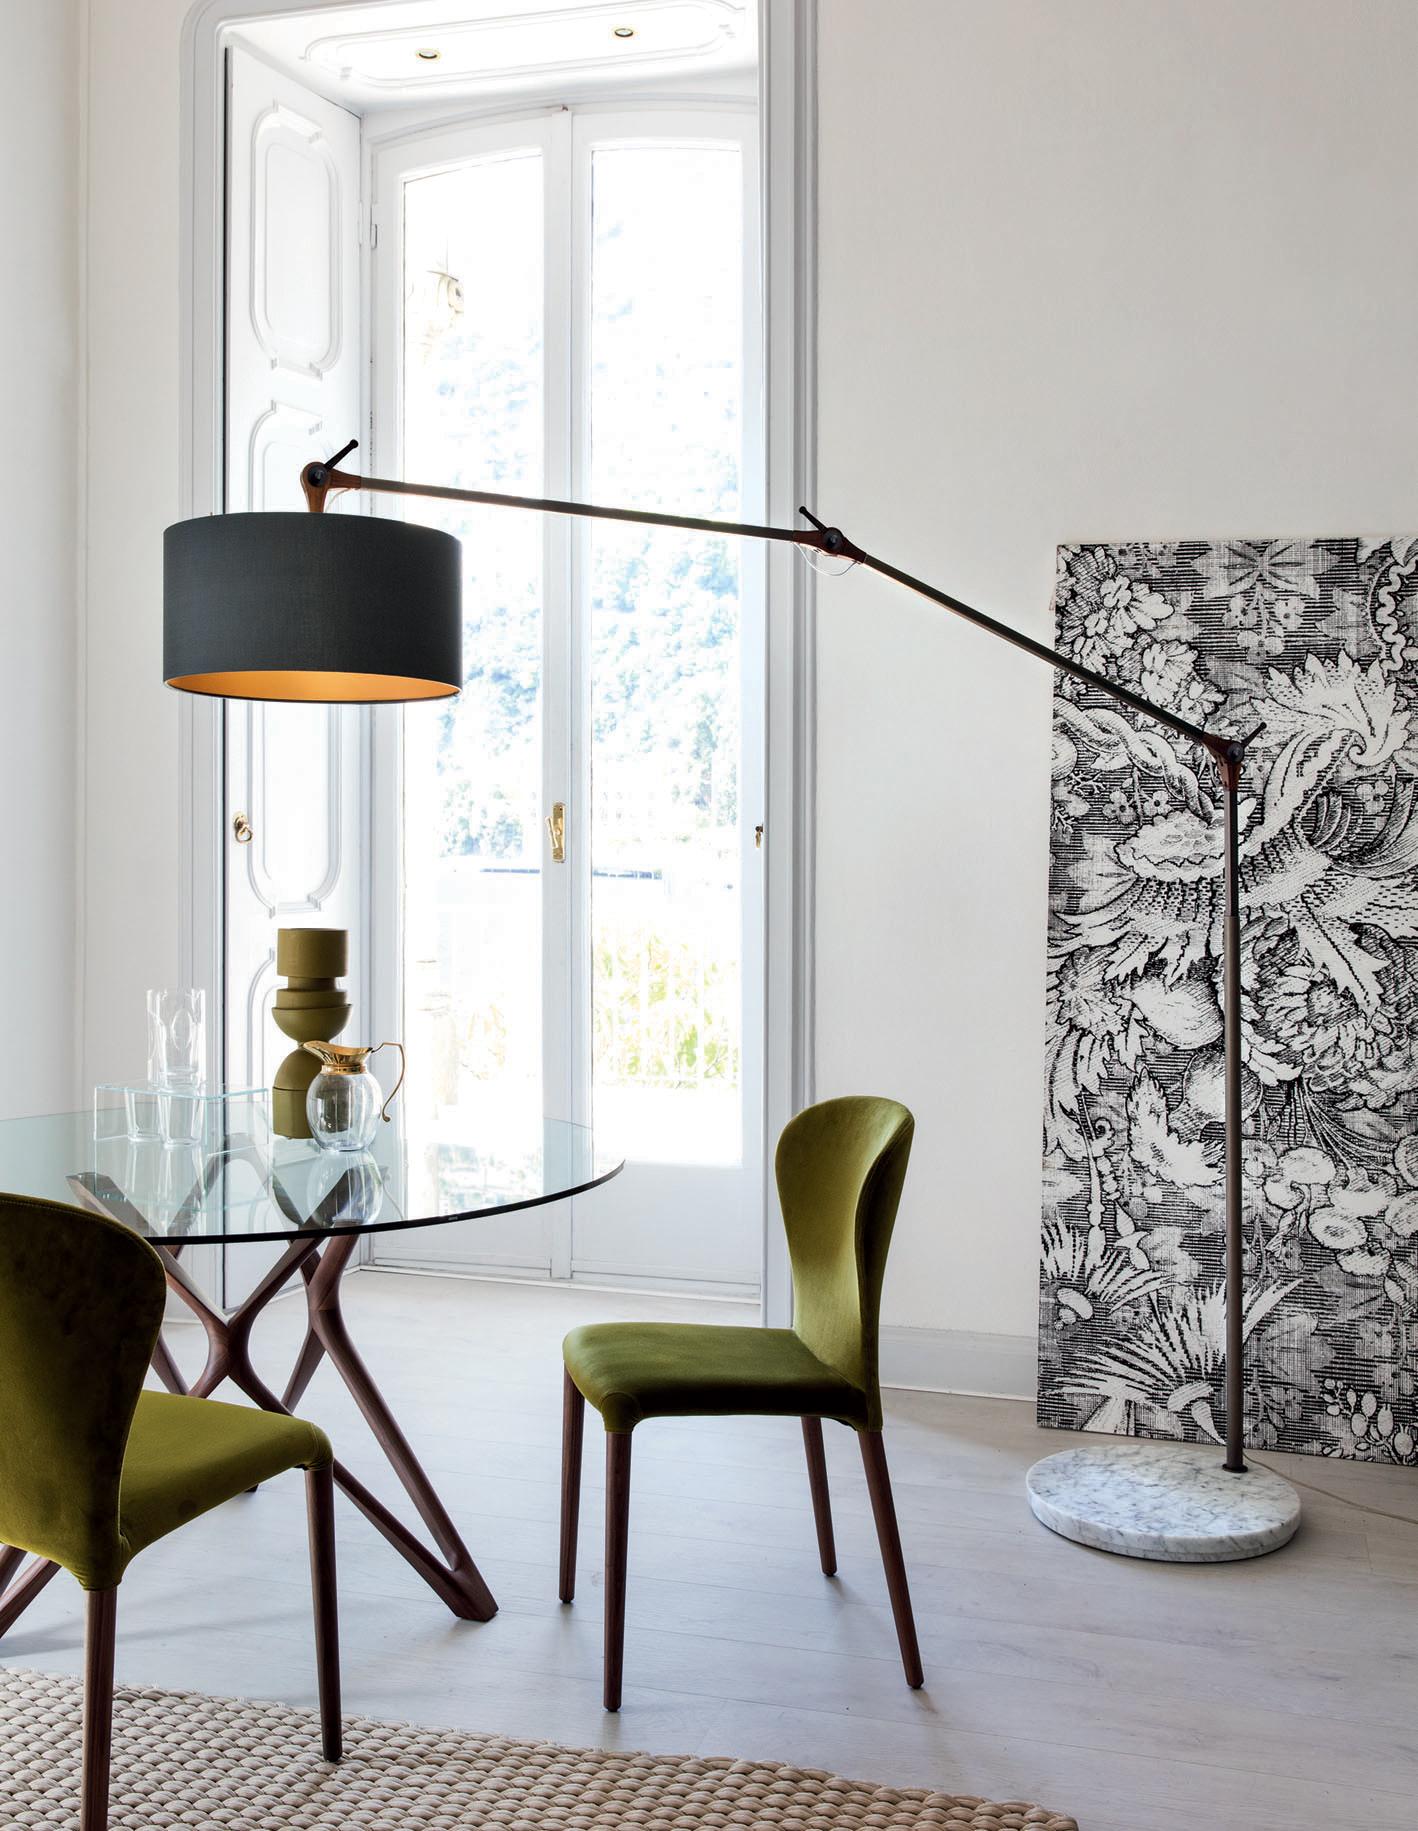 Big Living Room Floor Lamps - Living Room Ideas